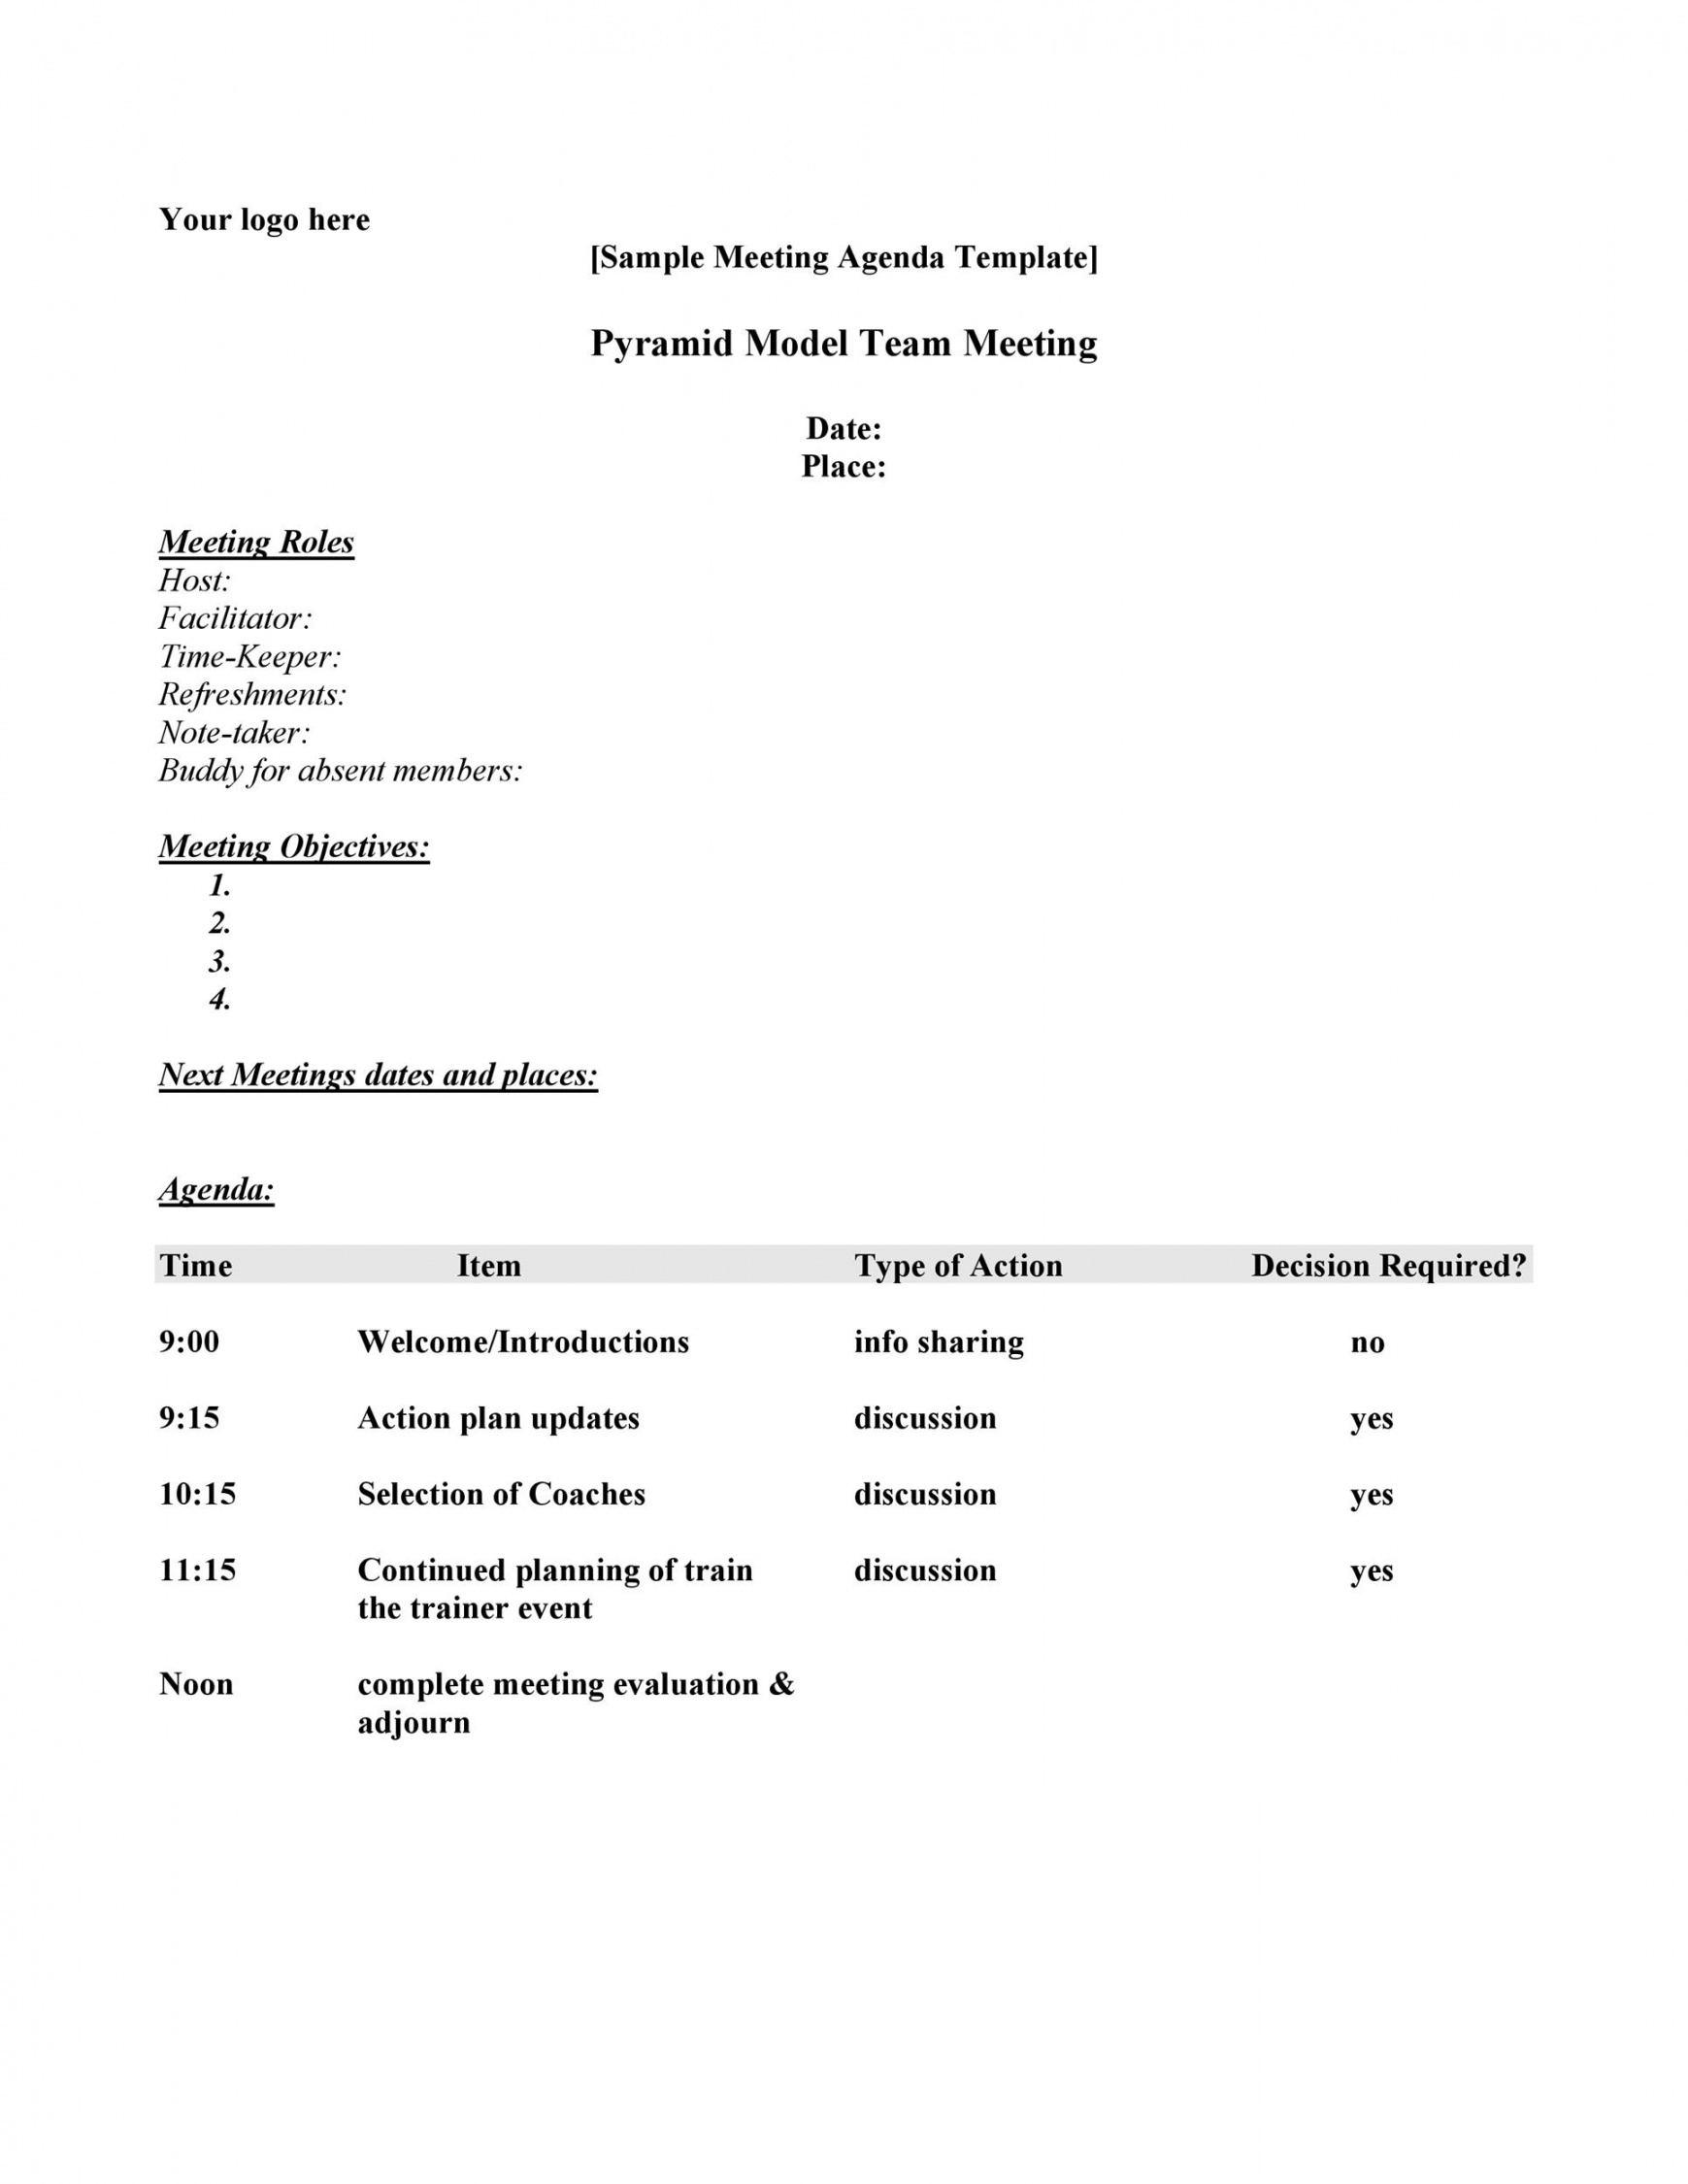 editable 46 effective meeting agenda templates ᐅ templatelab template for business meeting agenda example